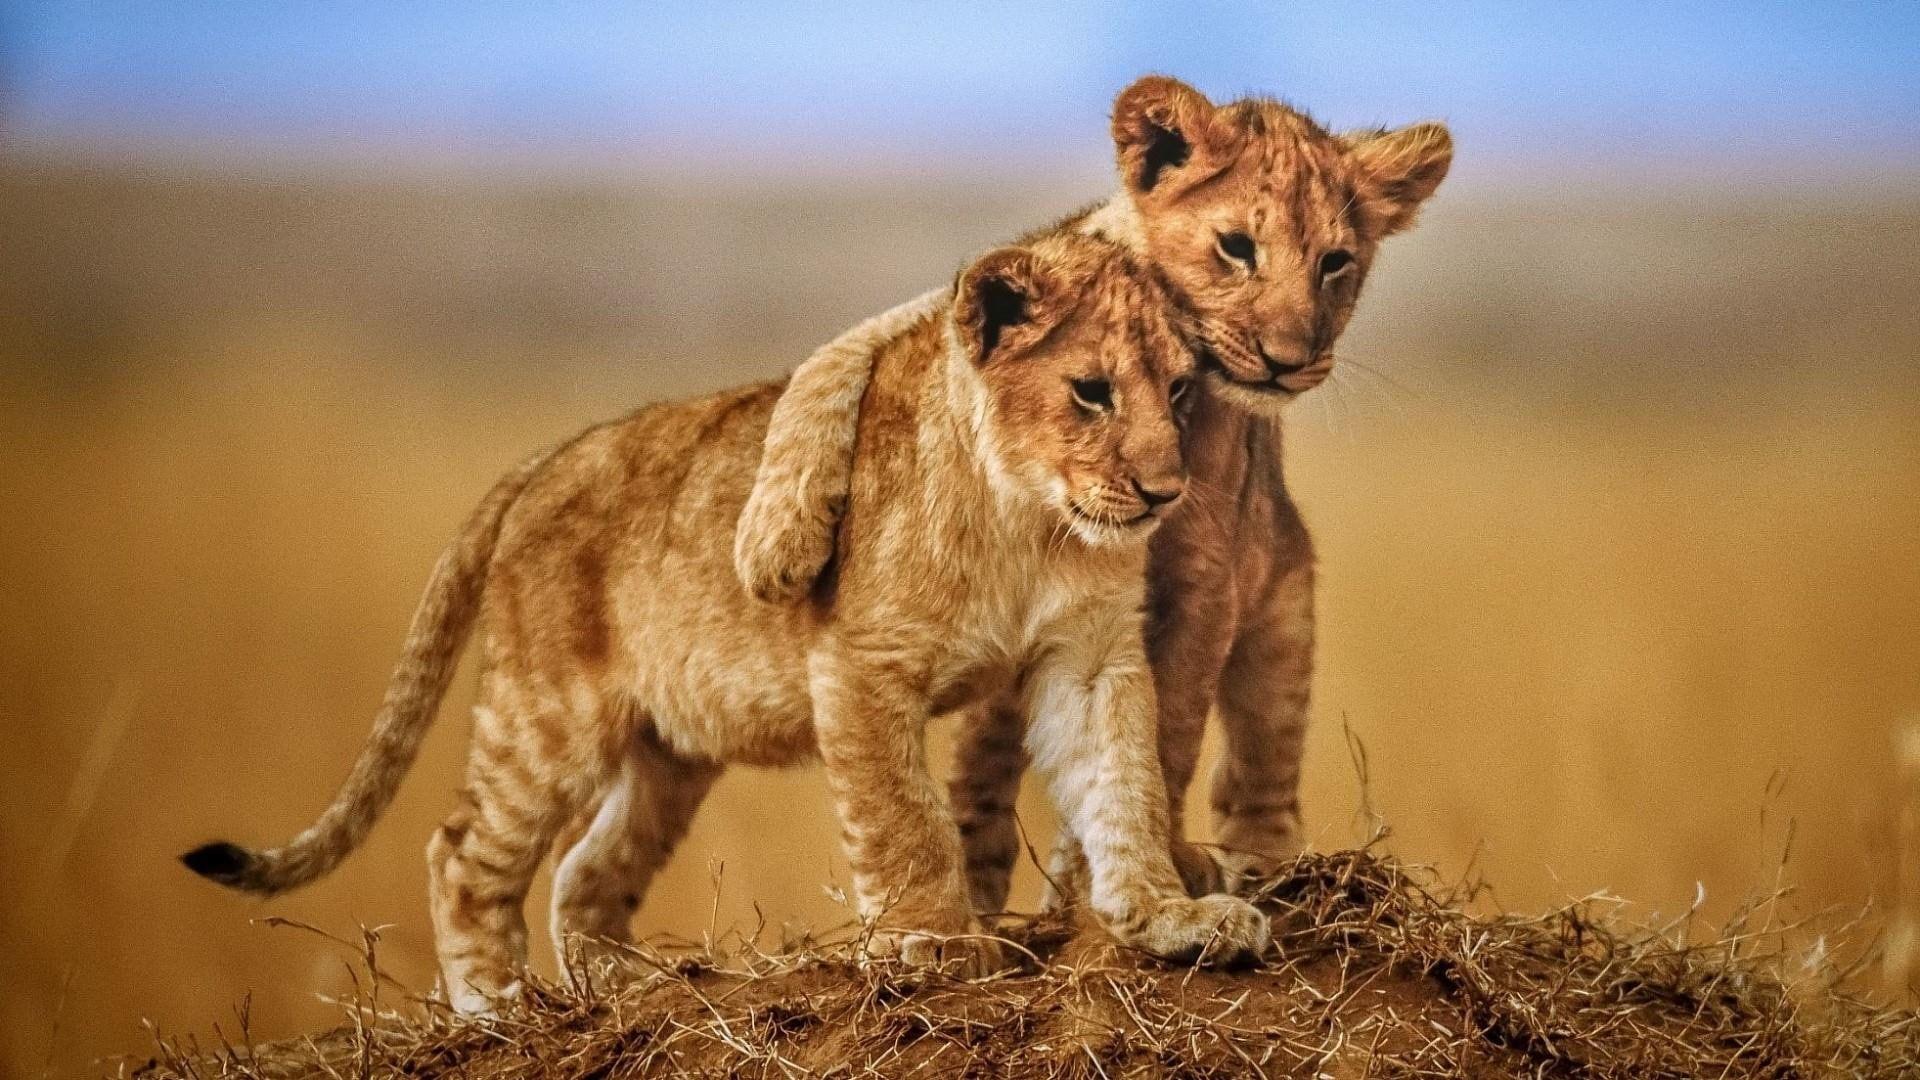 Wildlife Lion Cubs Cute Wild Animal Big Cats Savanna Safari 1080p Wallpaper Hdwallpaper Desktop Lion Hd Wallpaper Lion Wallpaper Animals Wild